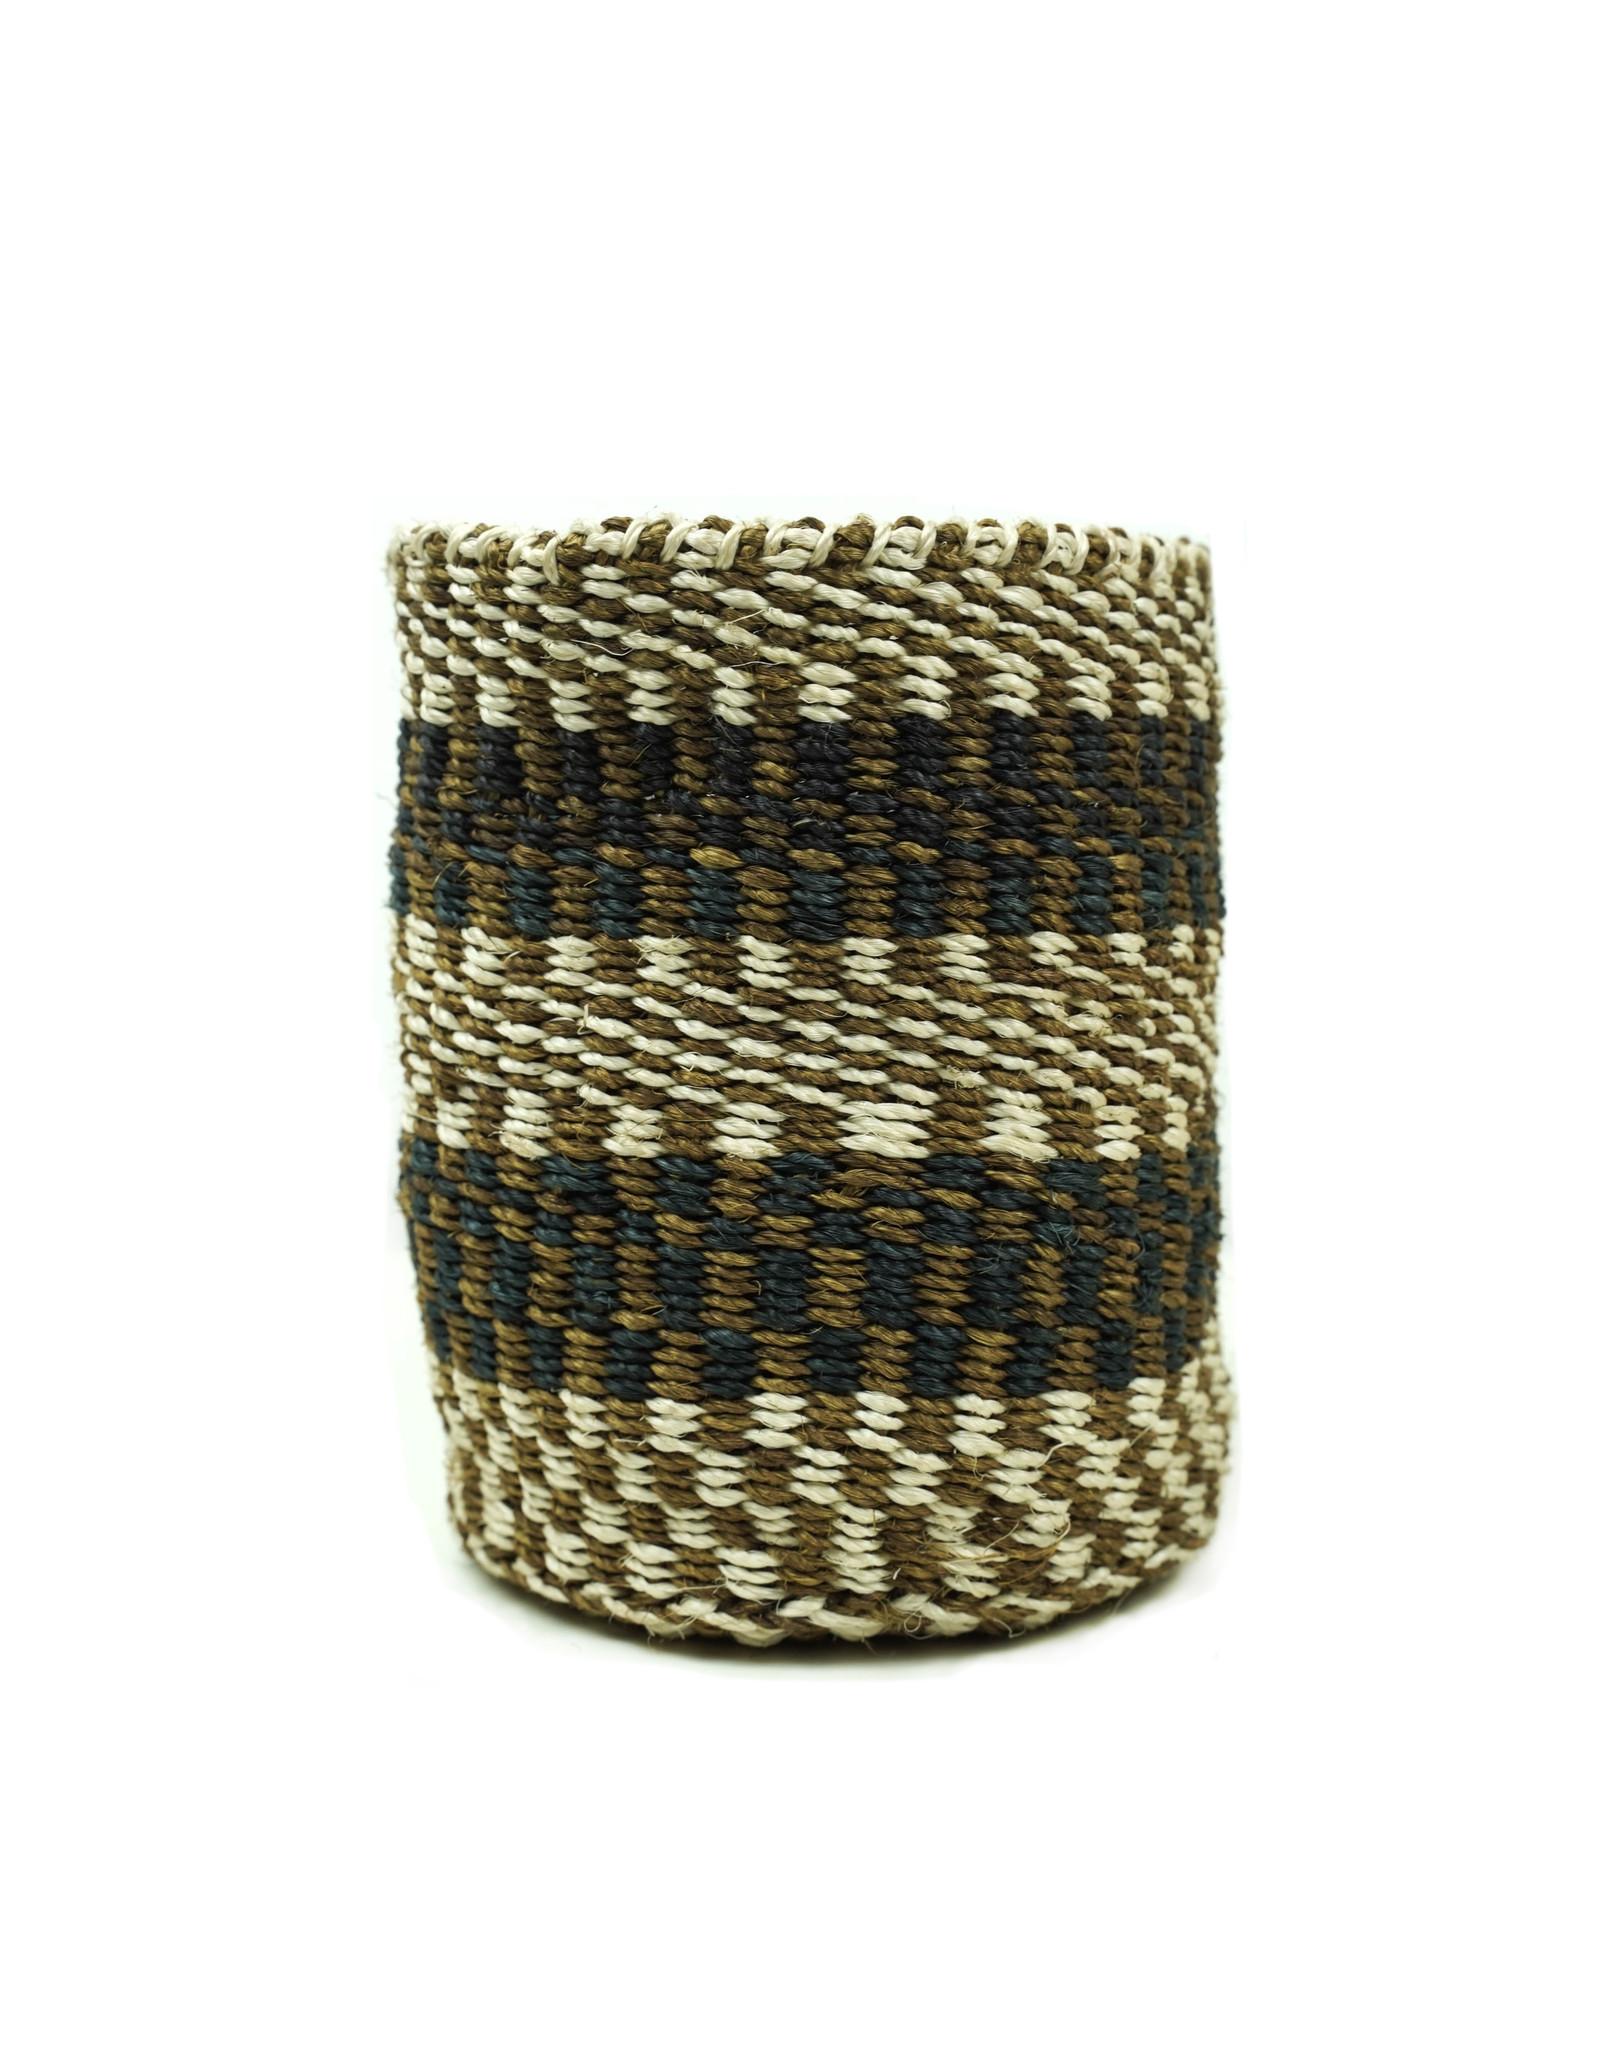 Maisha.Style Taita basket - black brown & ivory - S15